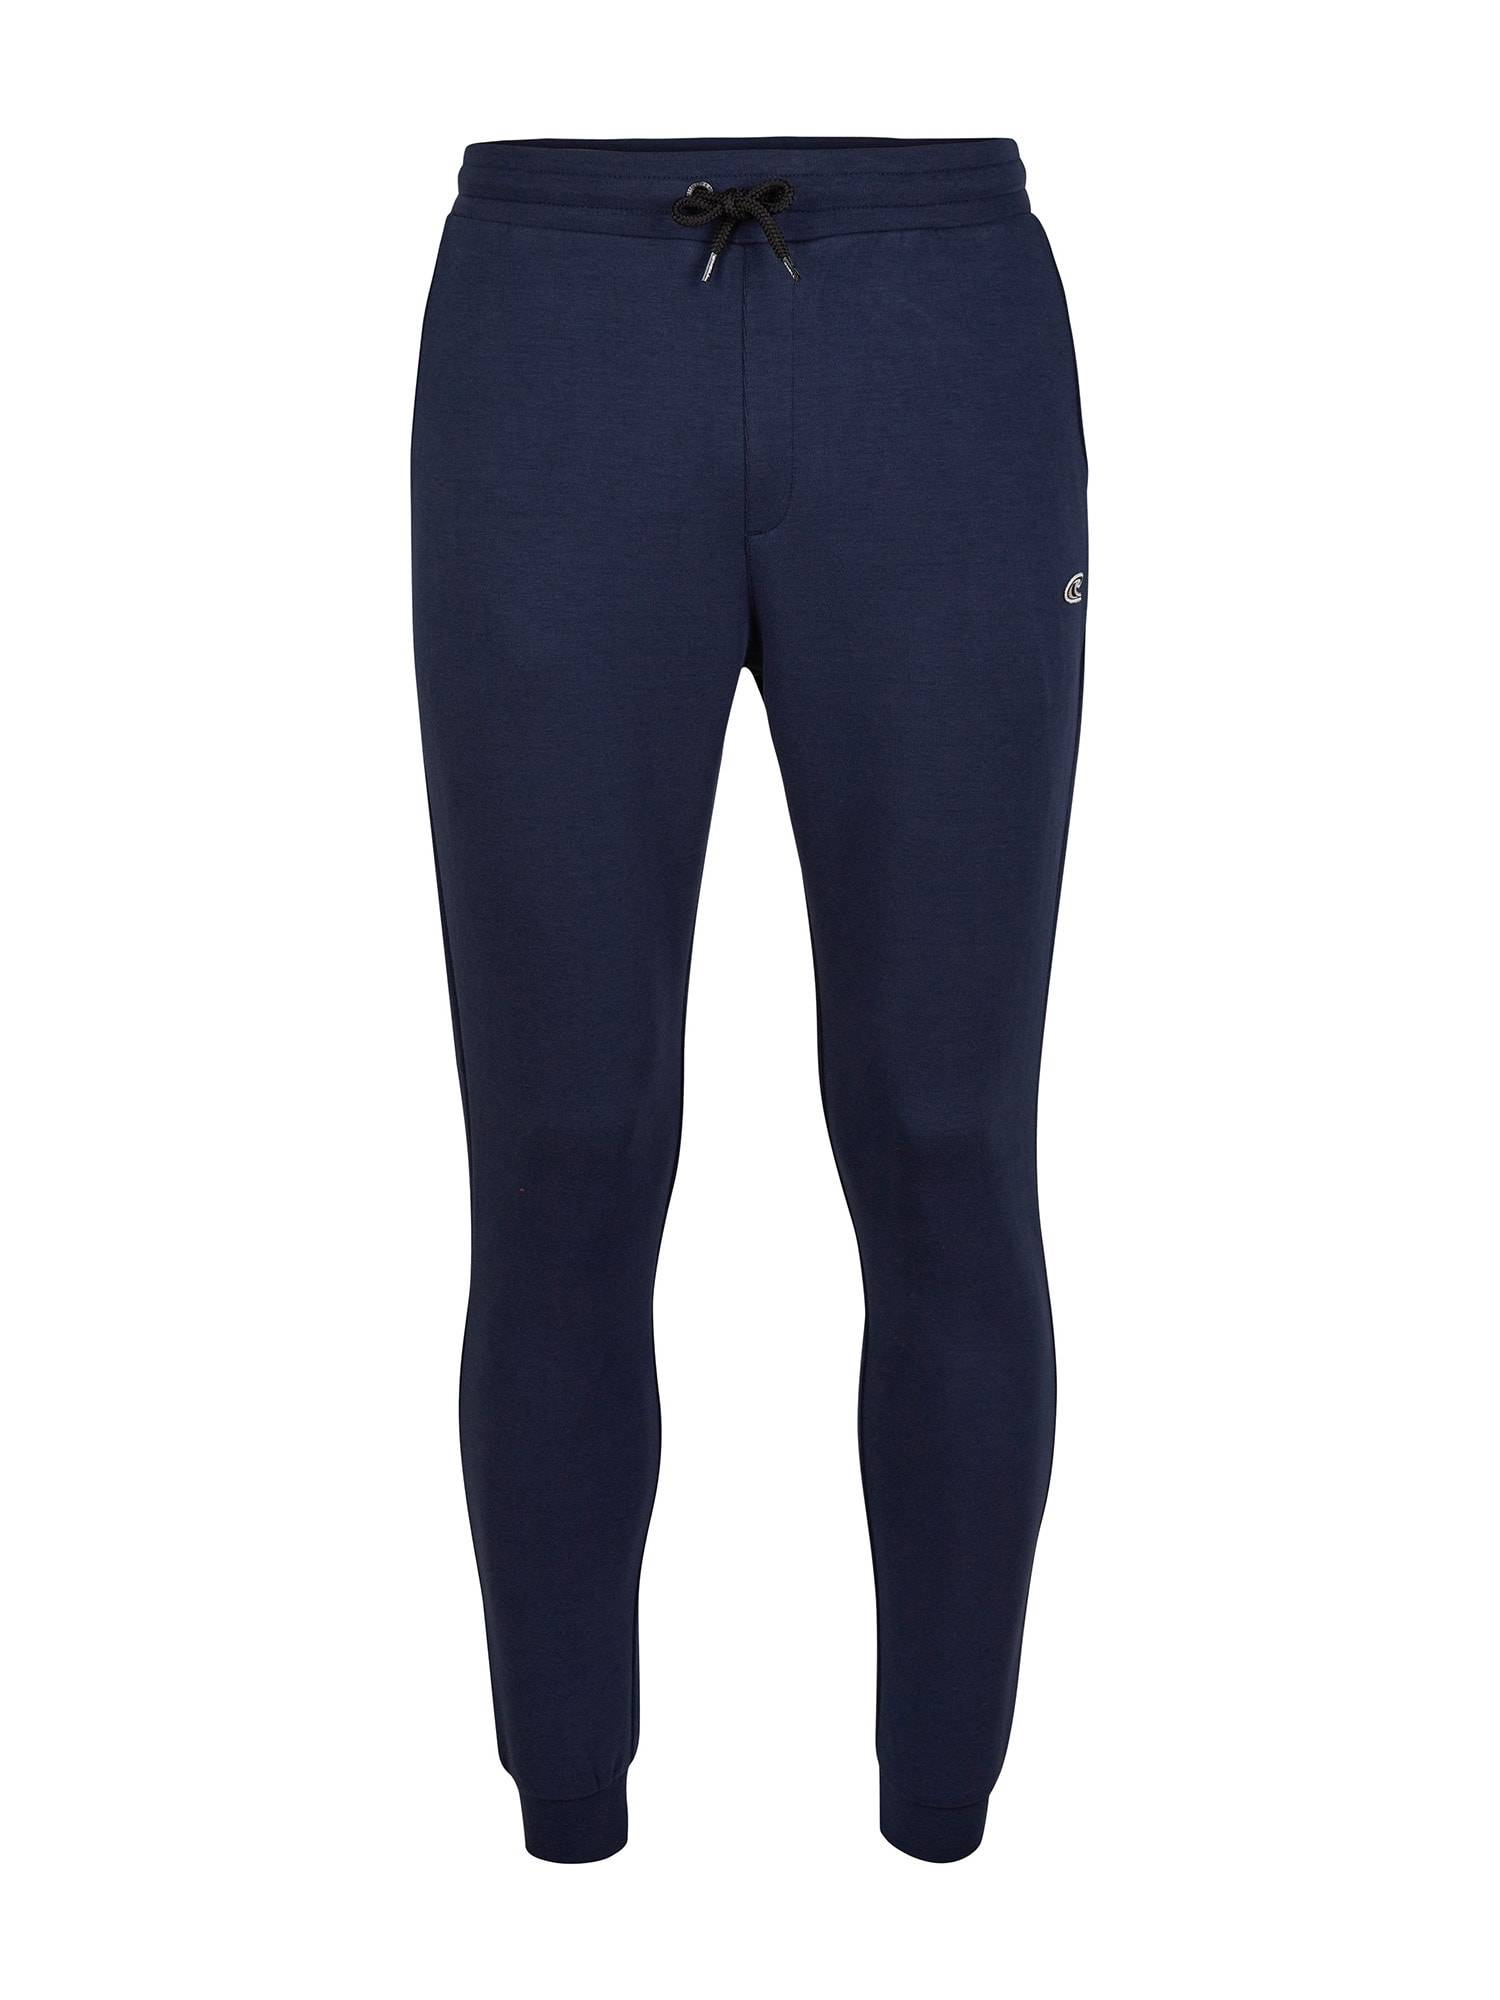 O'NEILL Pantalon 'Transit'  - Bleu - Taille: XL - male